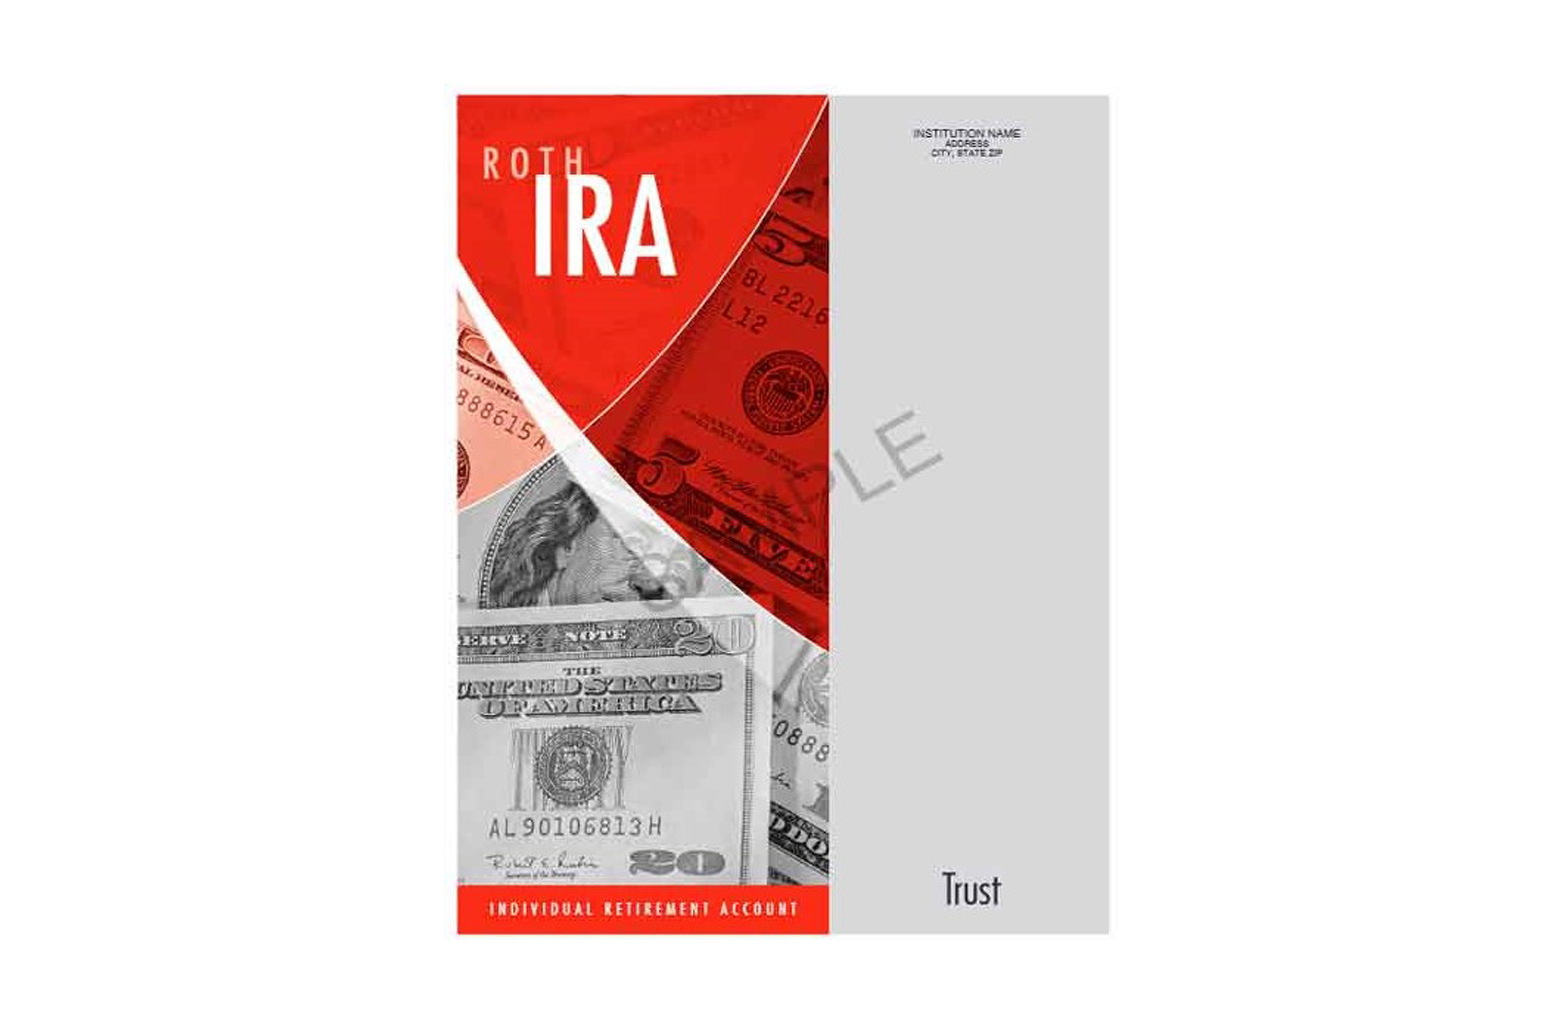 Roth IRA organiser - trust sample